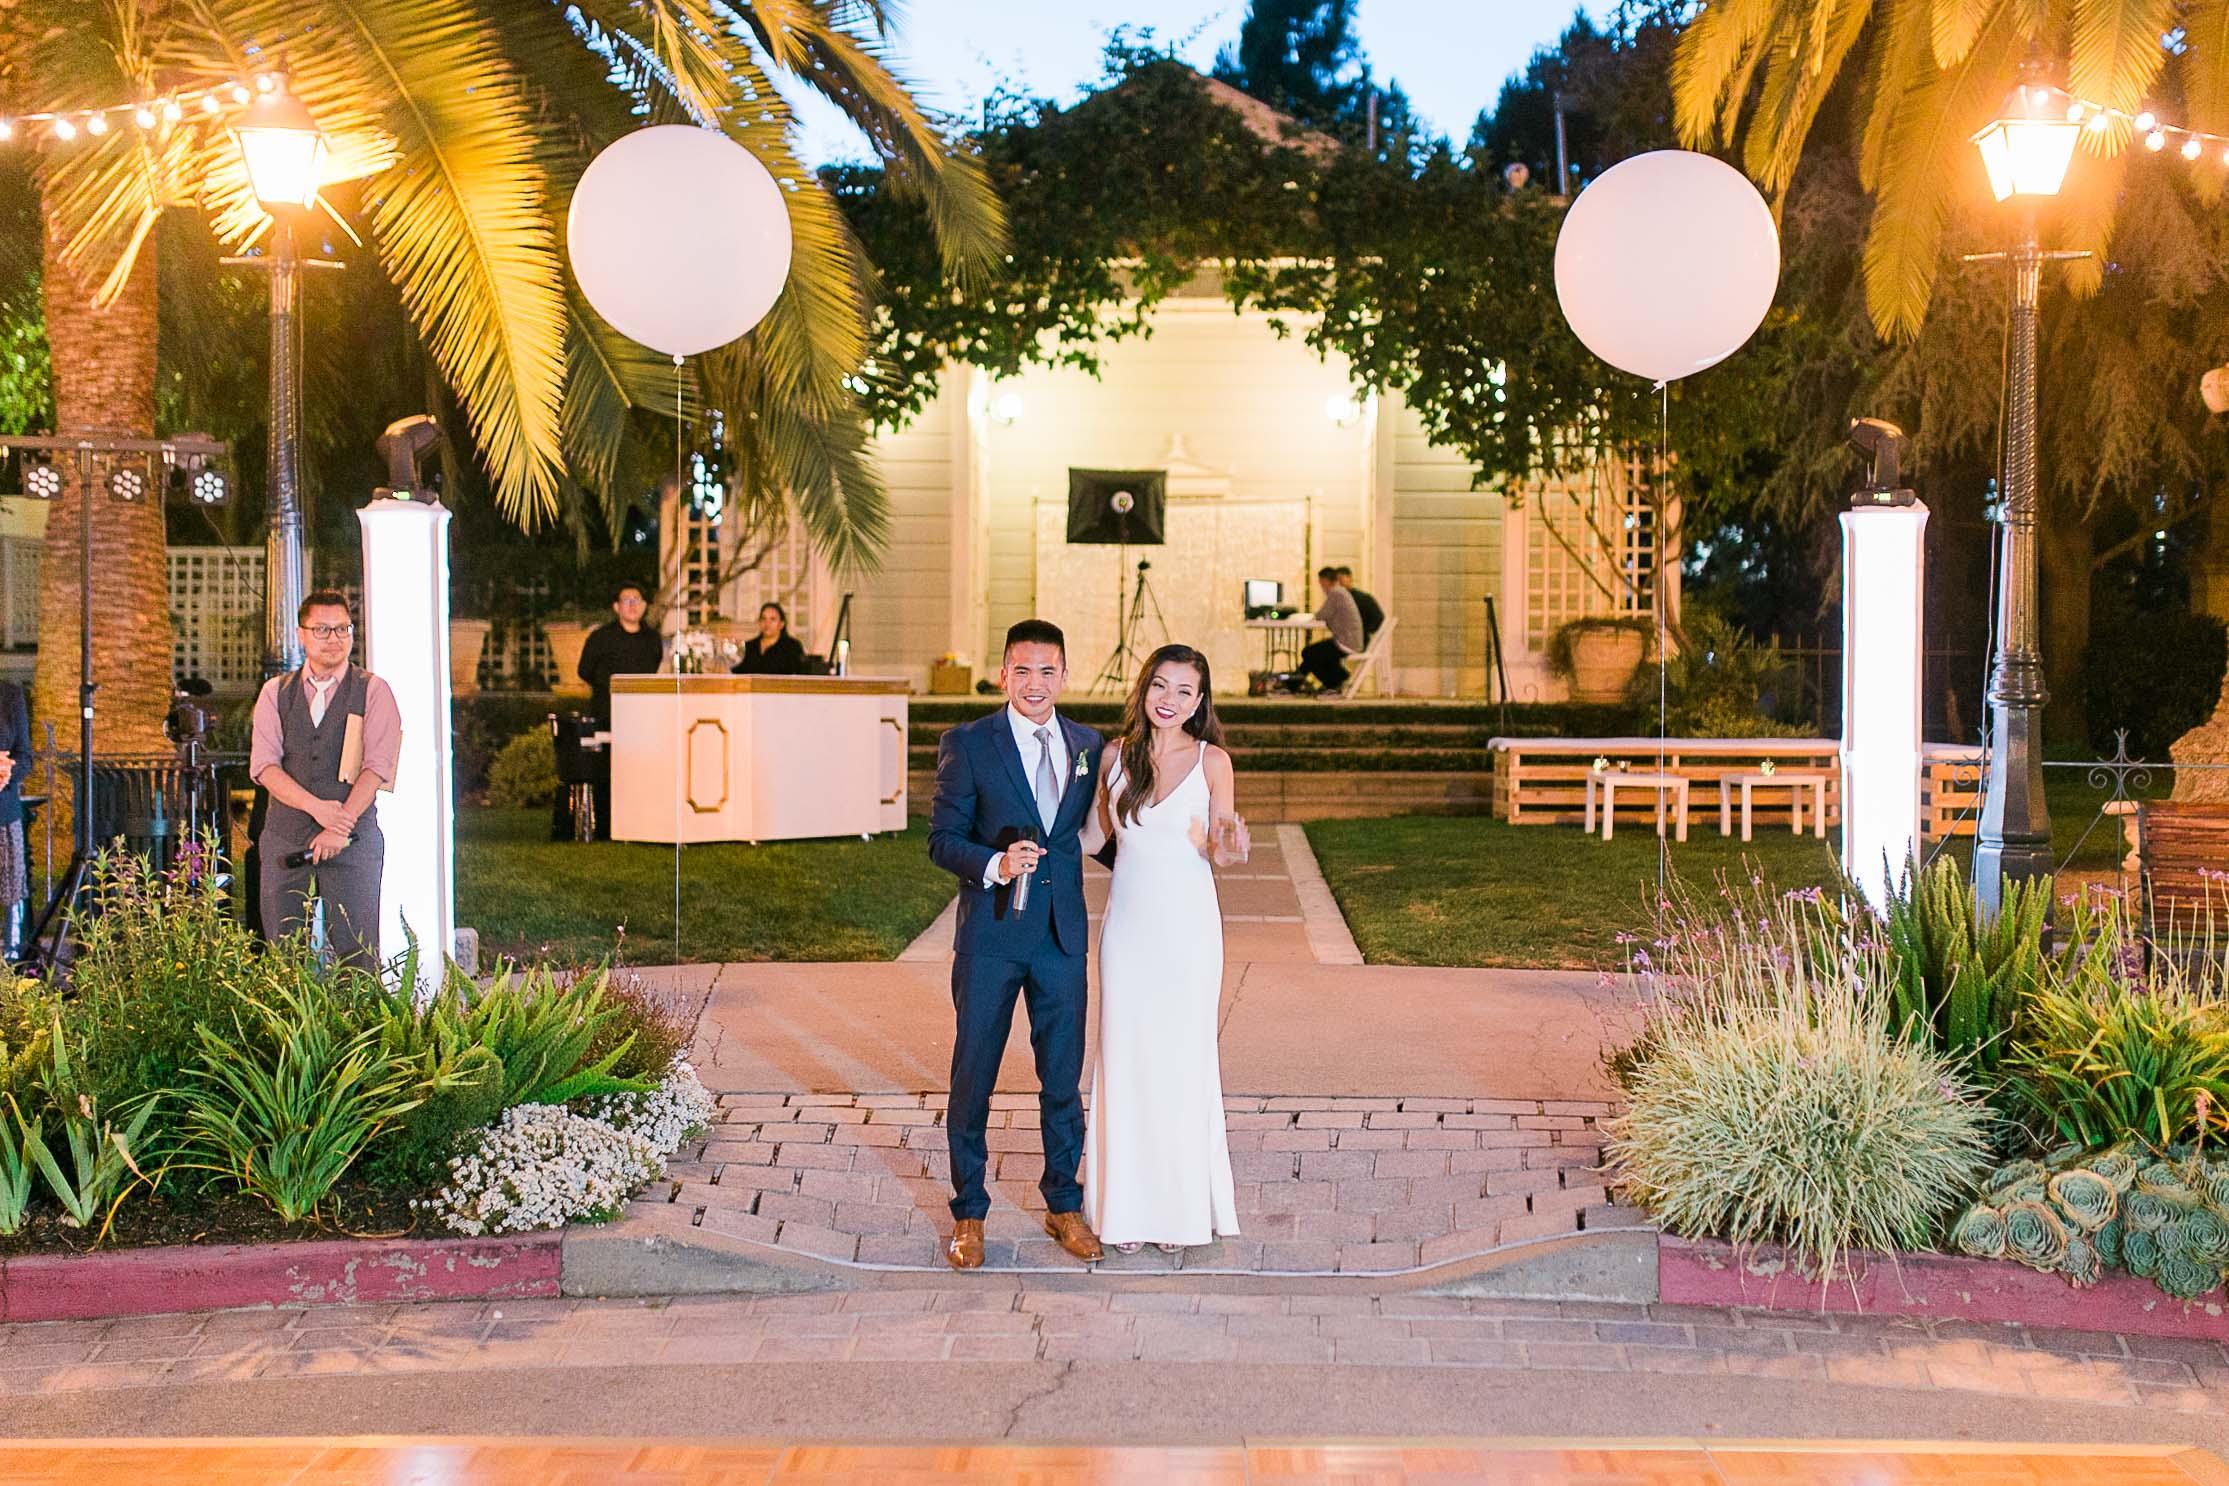 Wedding at Preservation Park in Oakland - Preservation Park Wedding Photos by JBJ Pictures San Francisco Photographer (60).jpg